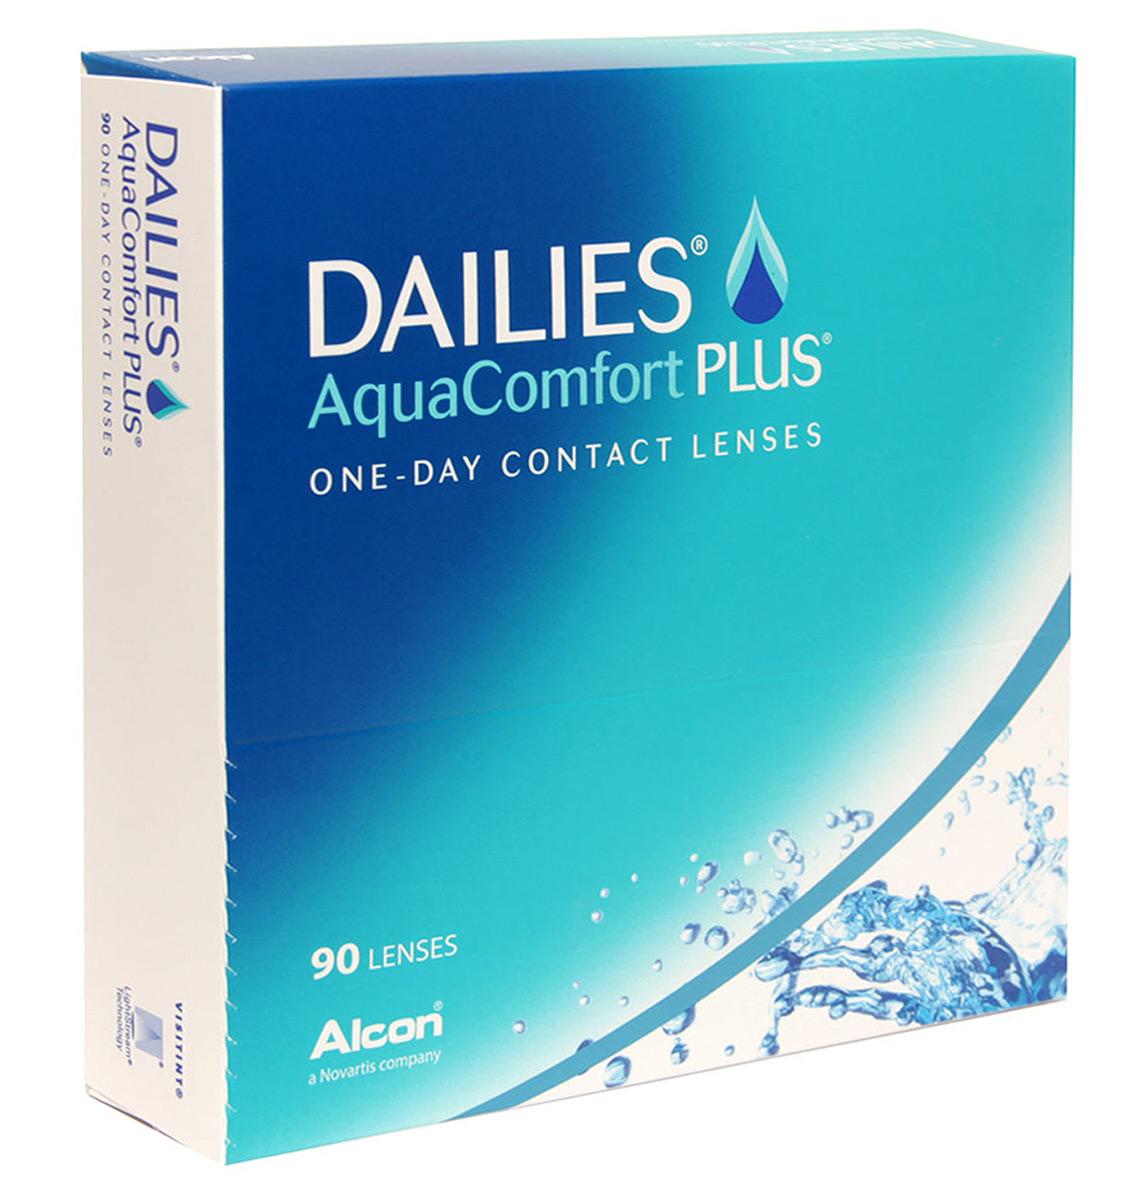 Alcon-CIBA Vision контактные линзы Dailies AquaComfort Plus (90шт / 8.7 / 14.0 / -3.75)